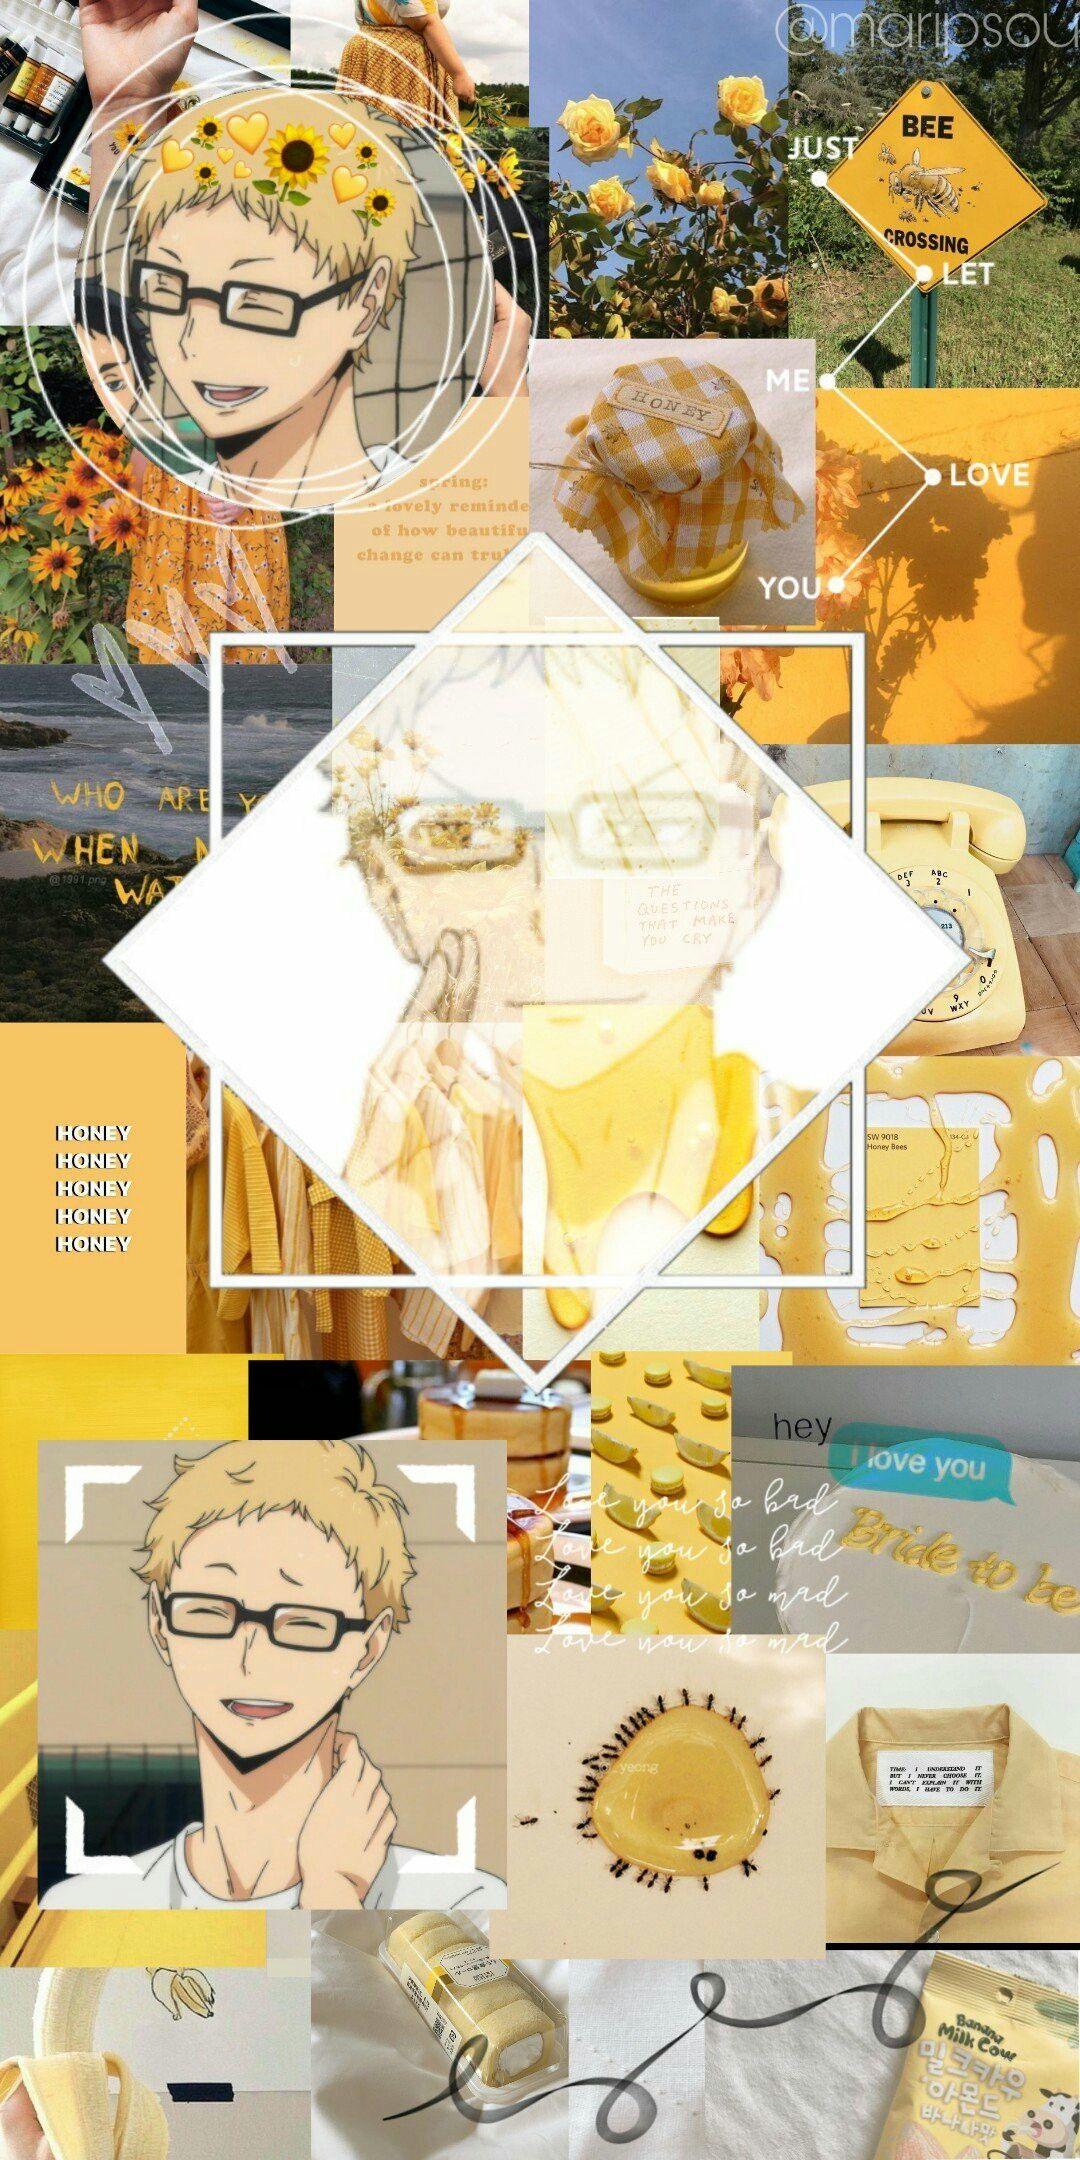 Aesthetic Haikyuu Phone Wallpapers - Wallpaper Cave